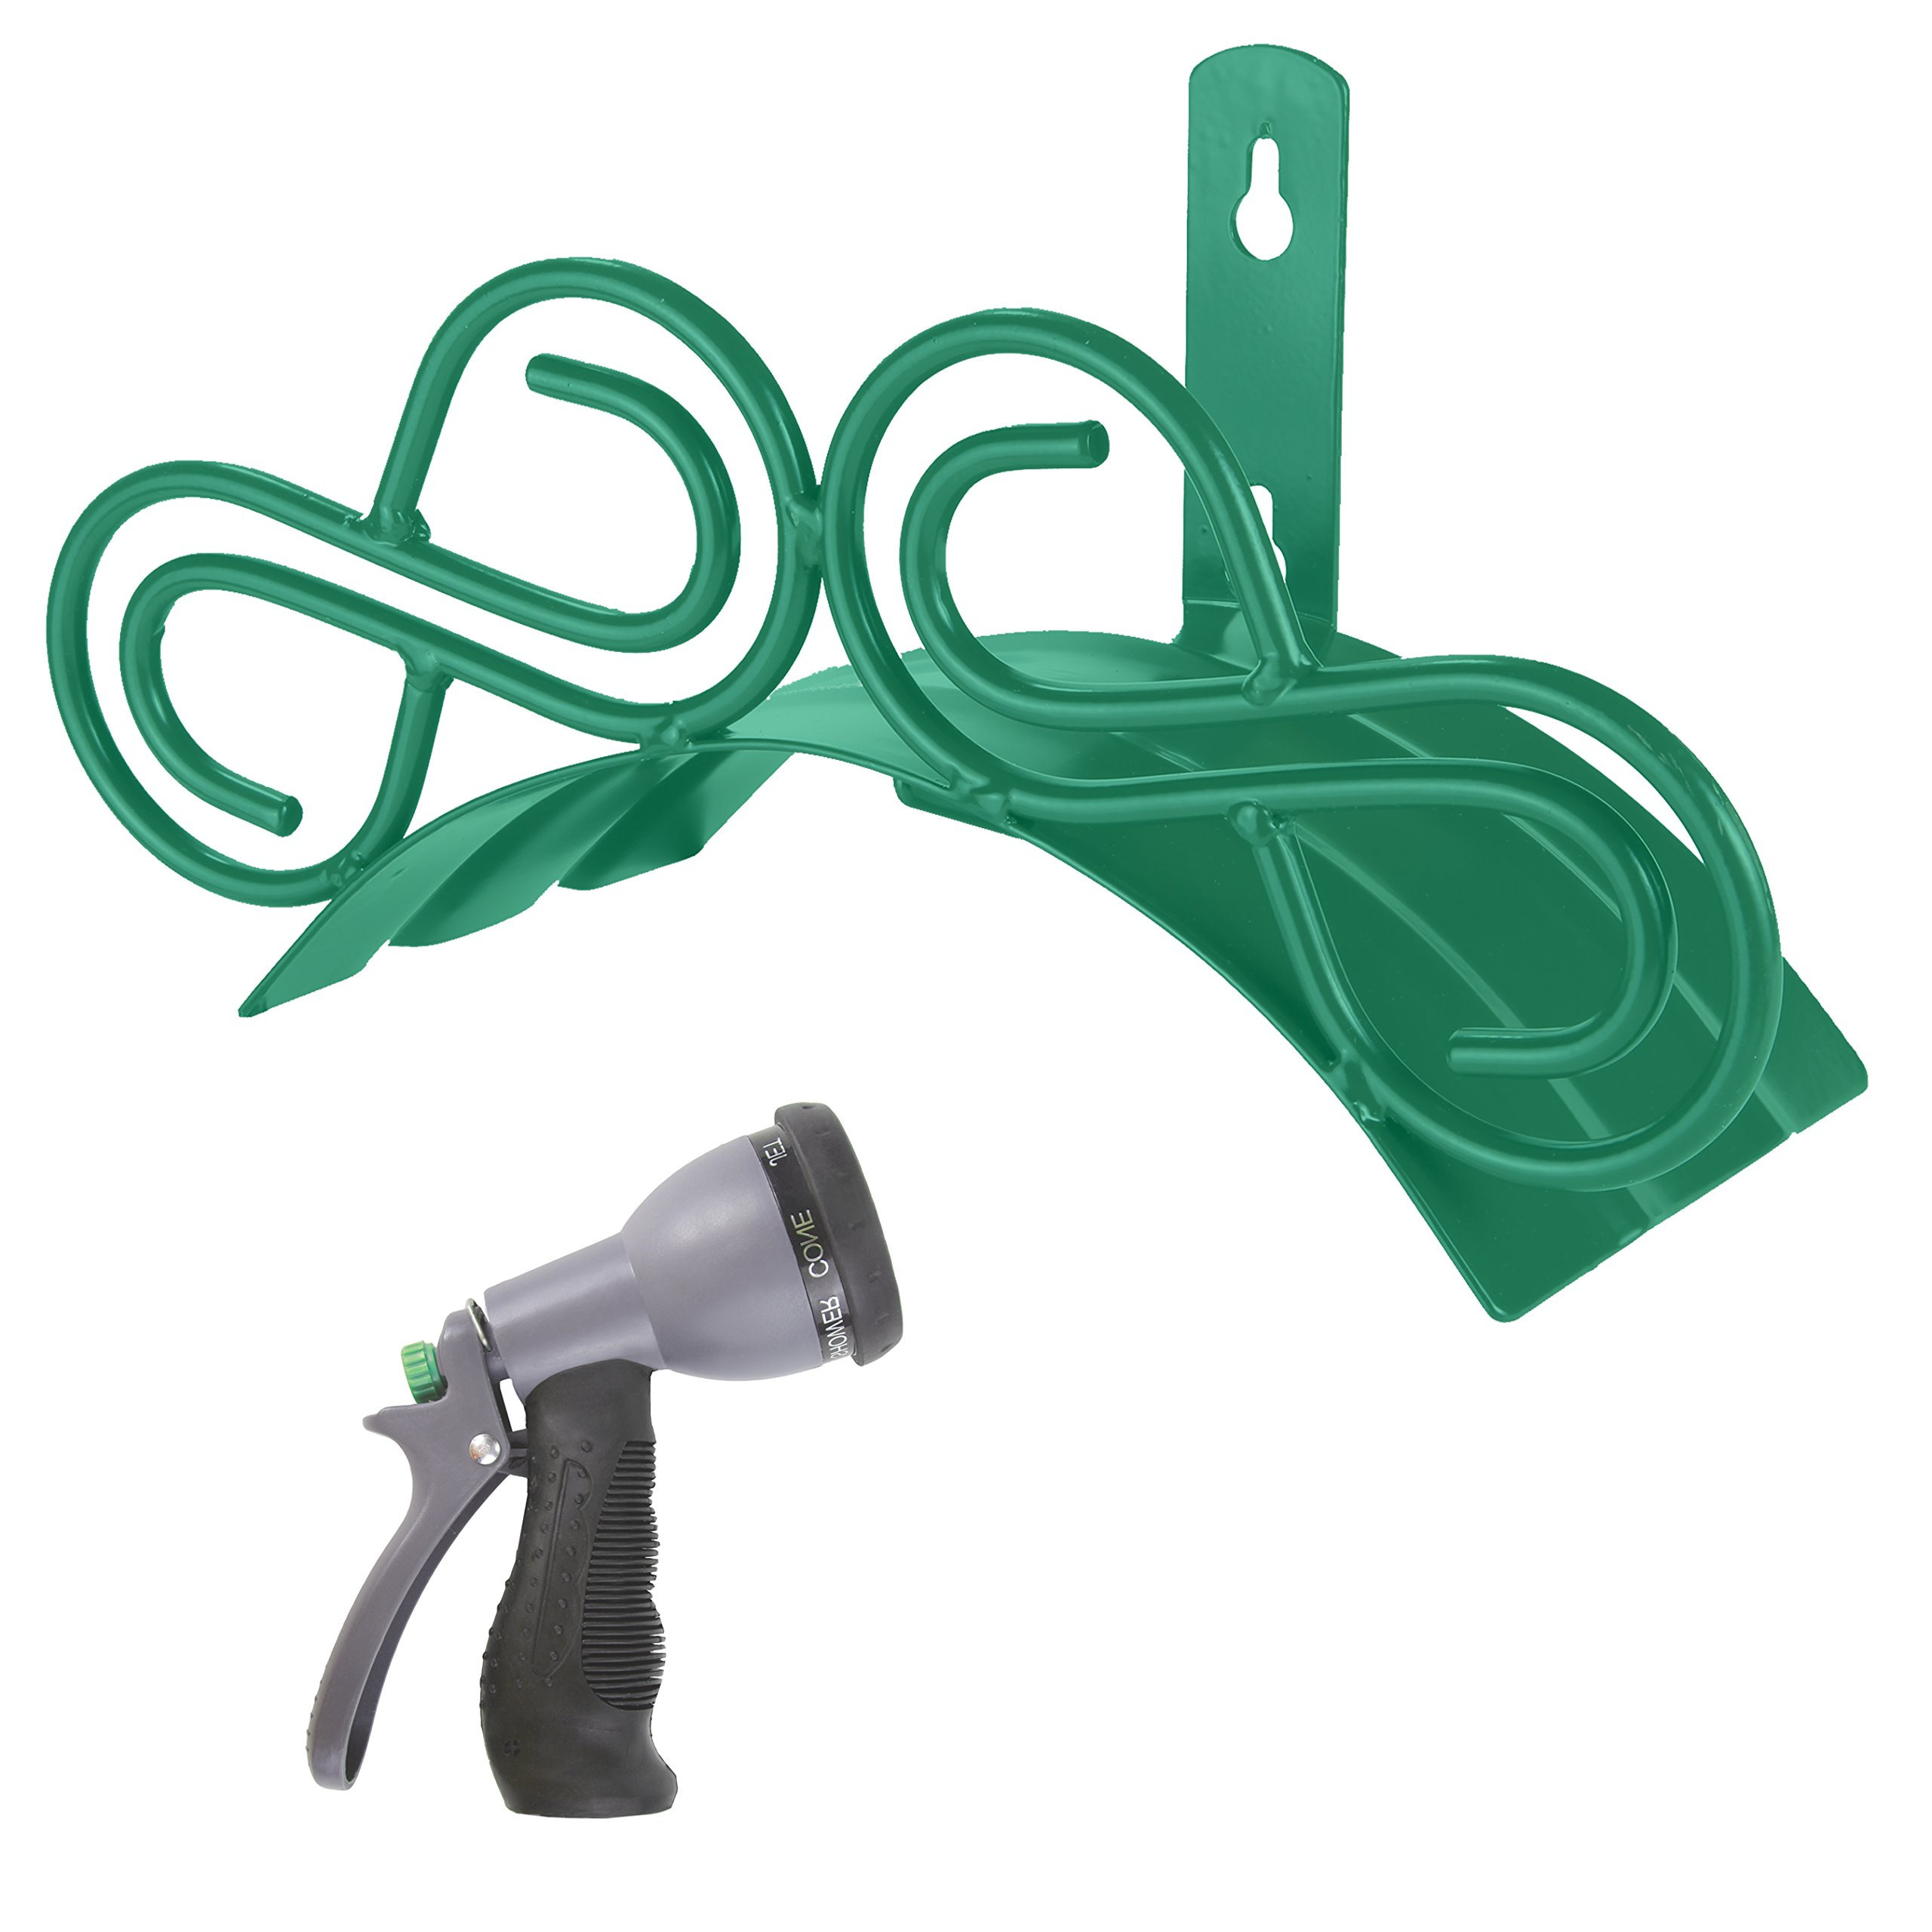 Decorative Garden Hose Holder. Wall Mount Hanger Including Spray Nozzle.  (Green)